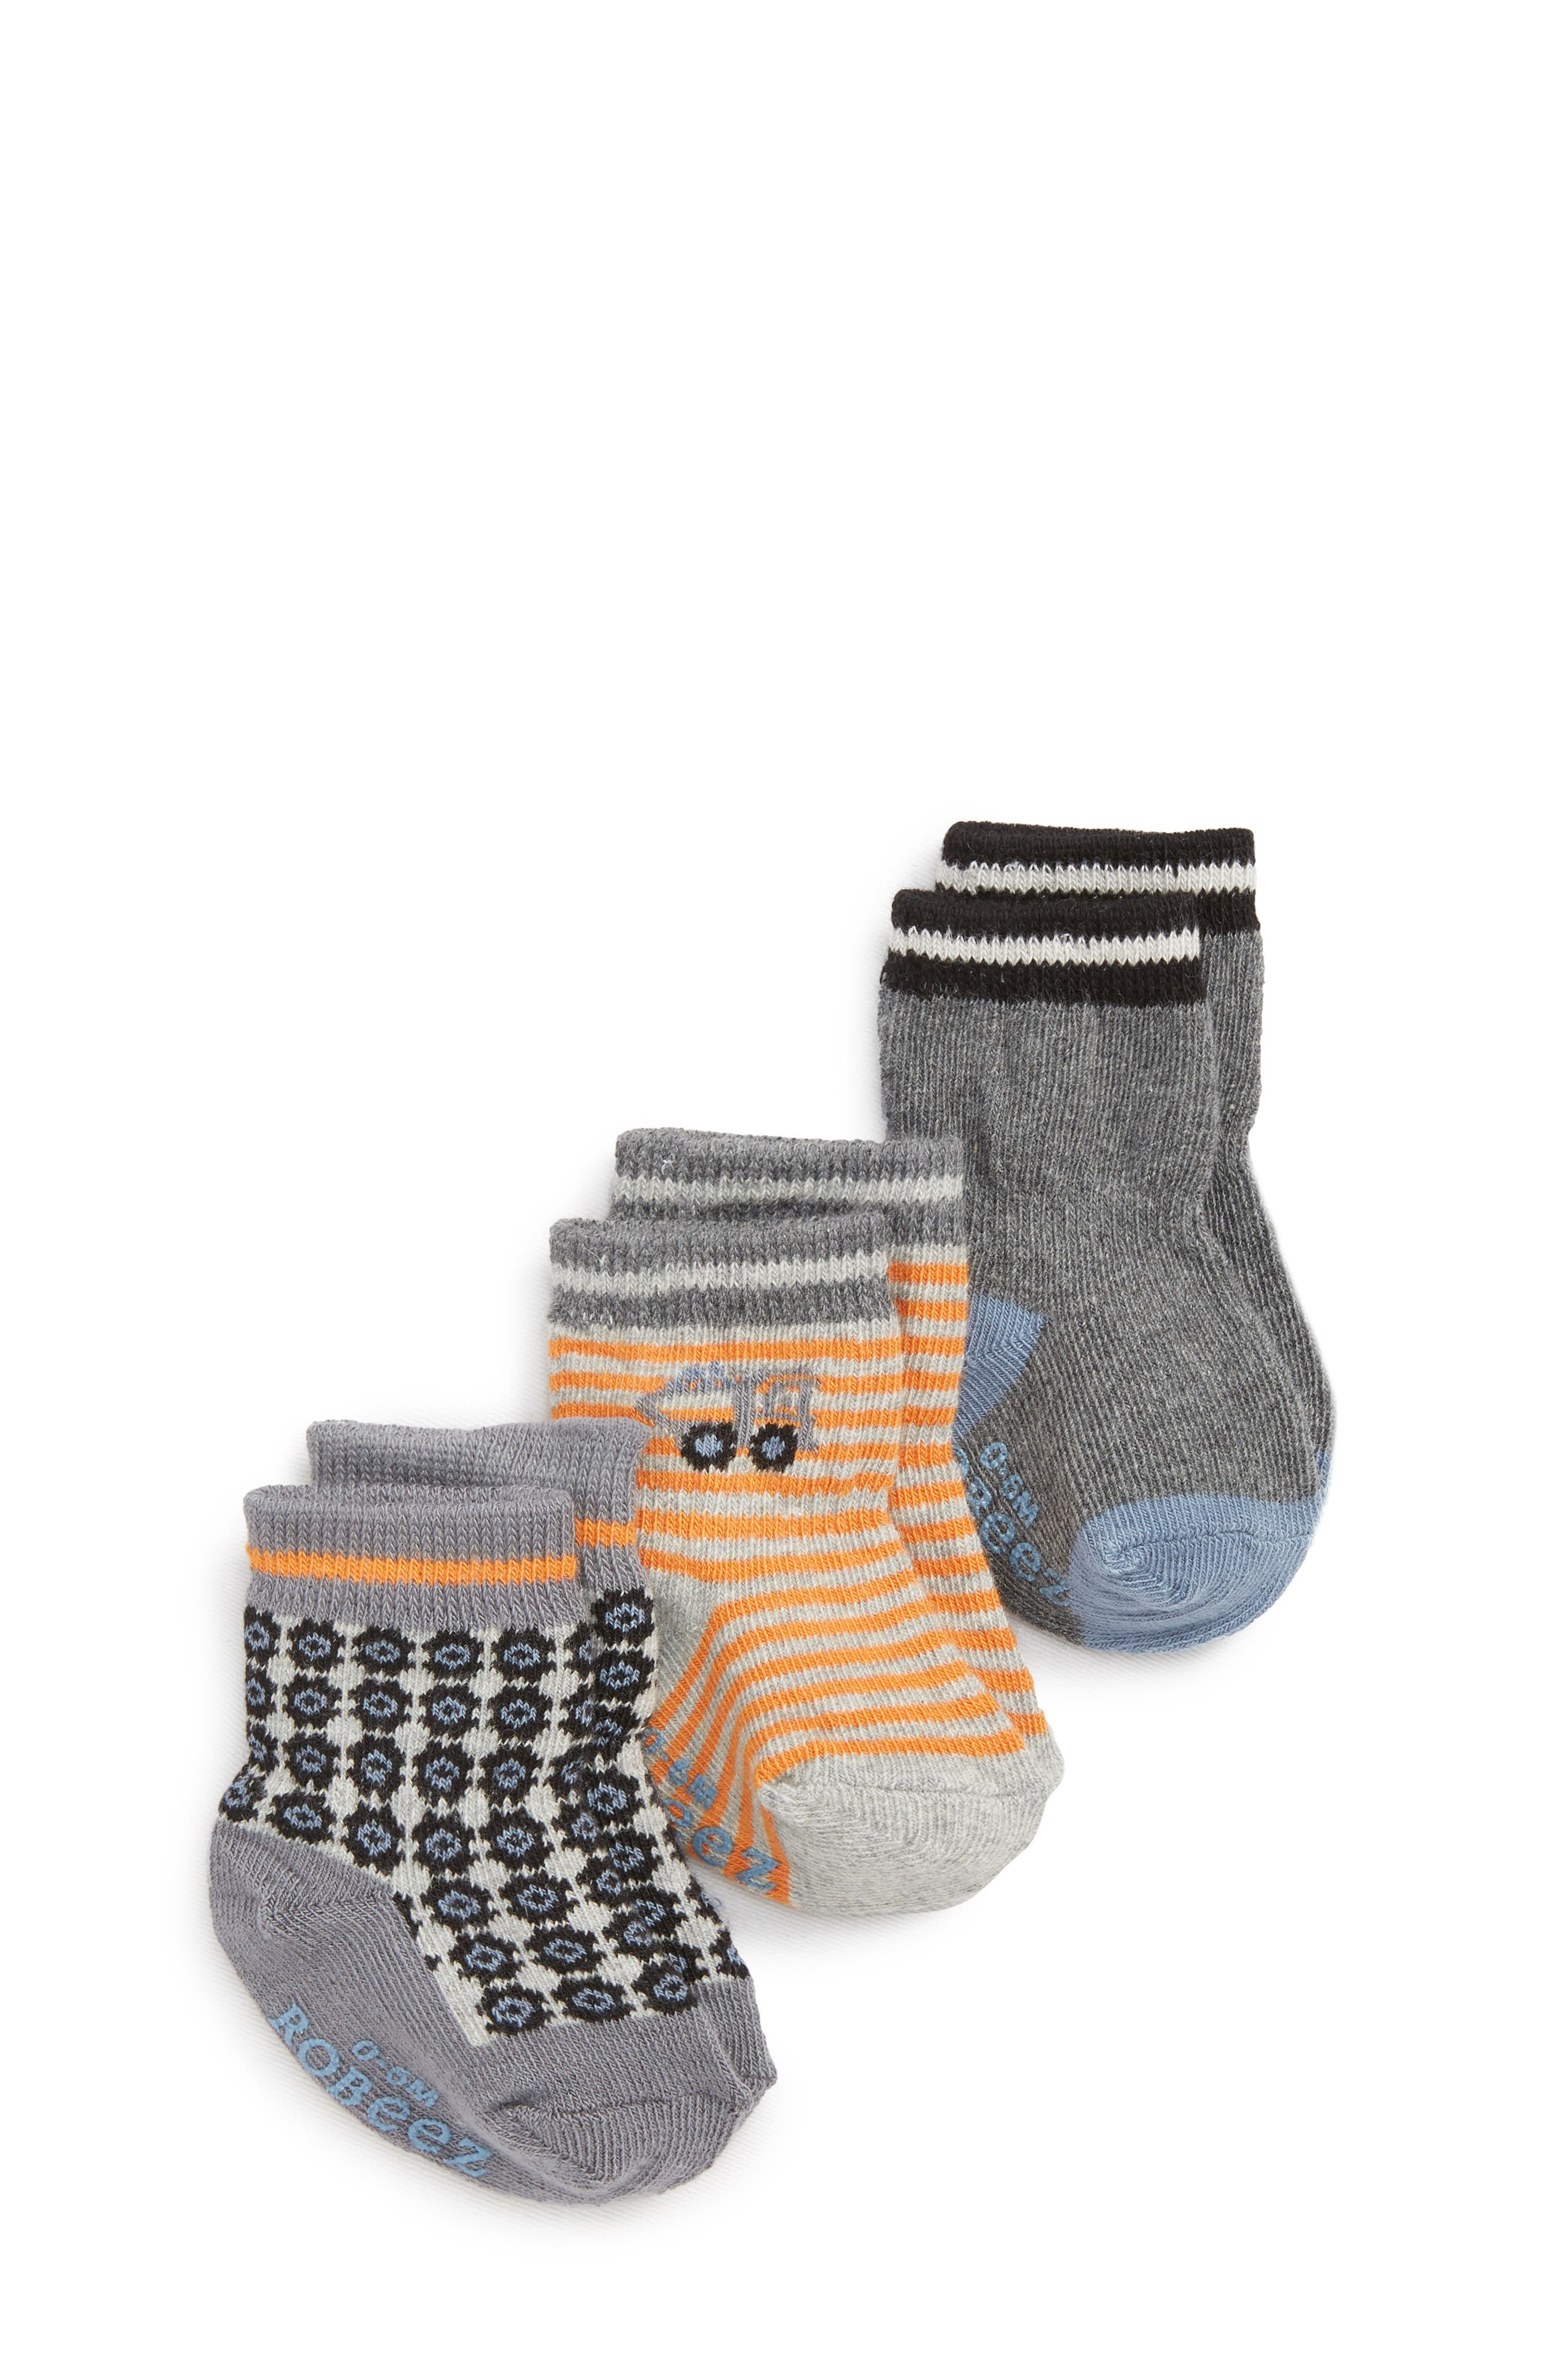 Gravel & Gears 3-Pack Socks,                             Main thumbnail 1, color,                             GREY/ ORANGE/ BLUE